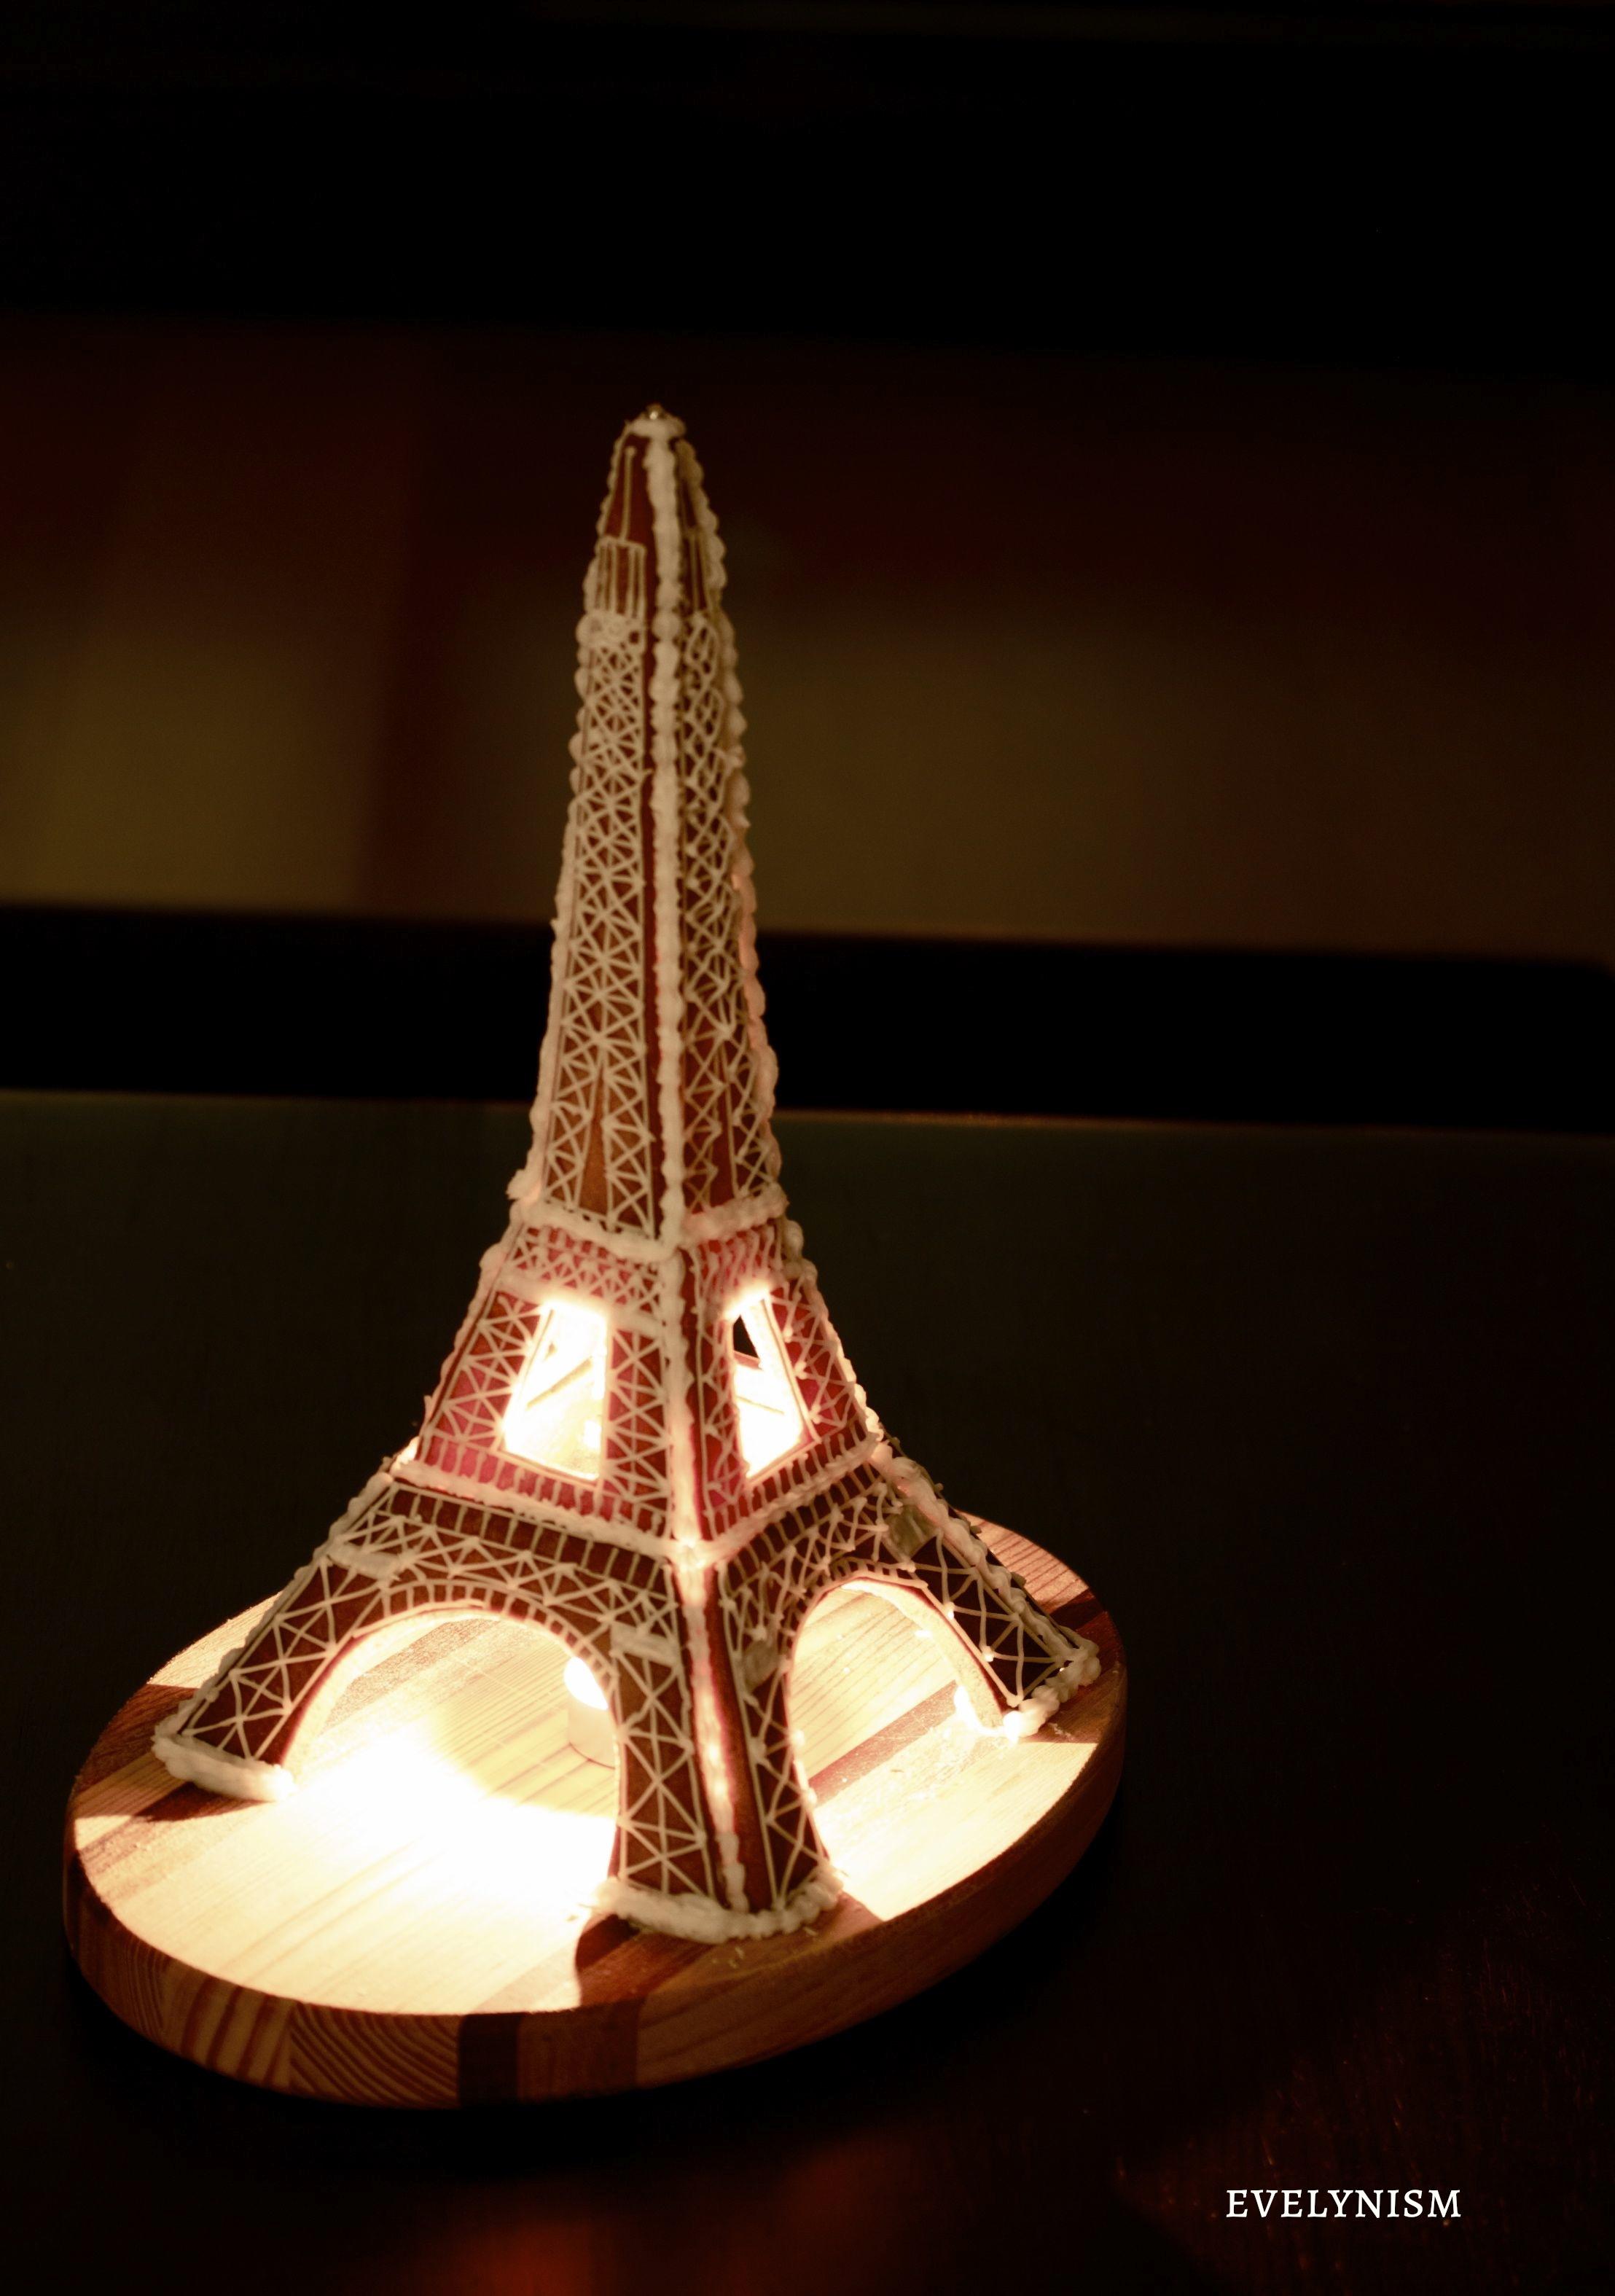 Gingerbread Eiffel Tower | 100 Days Of Evelyn